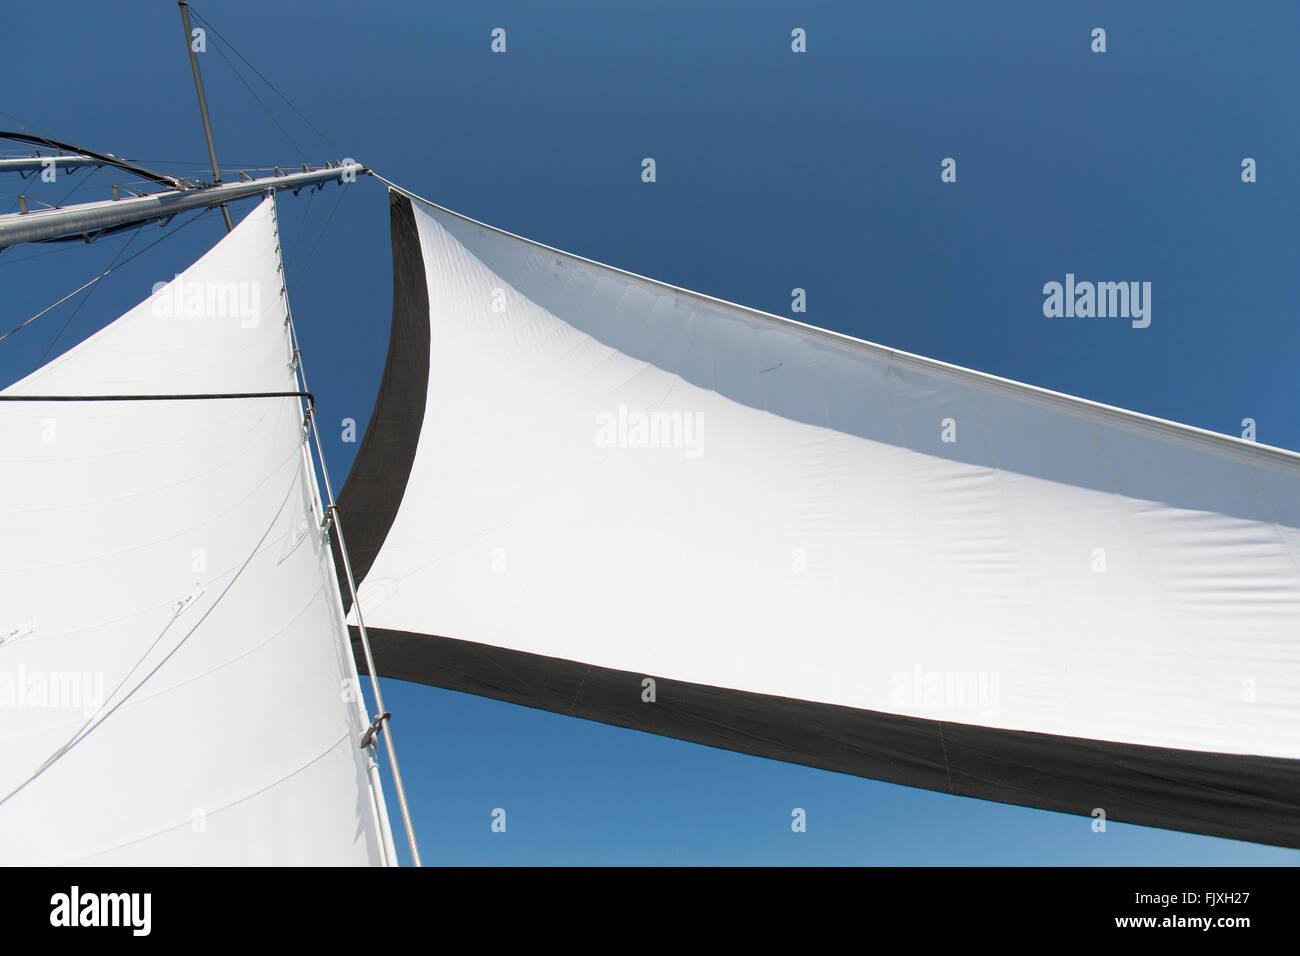 A sail on a sailboat. - Stock Image